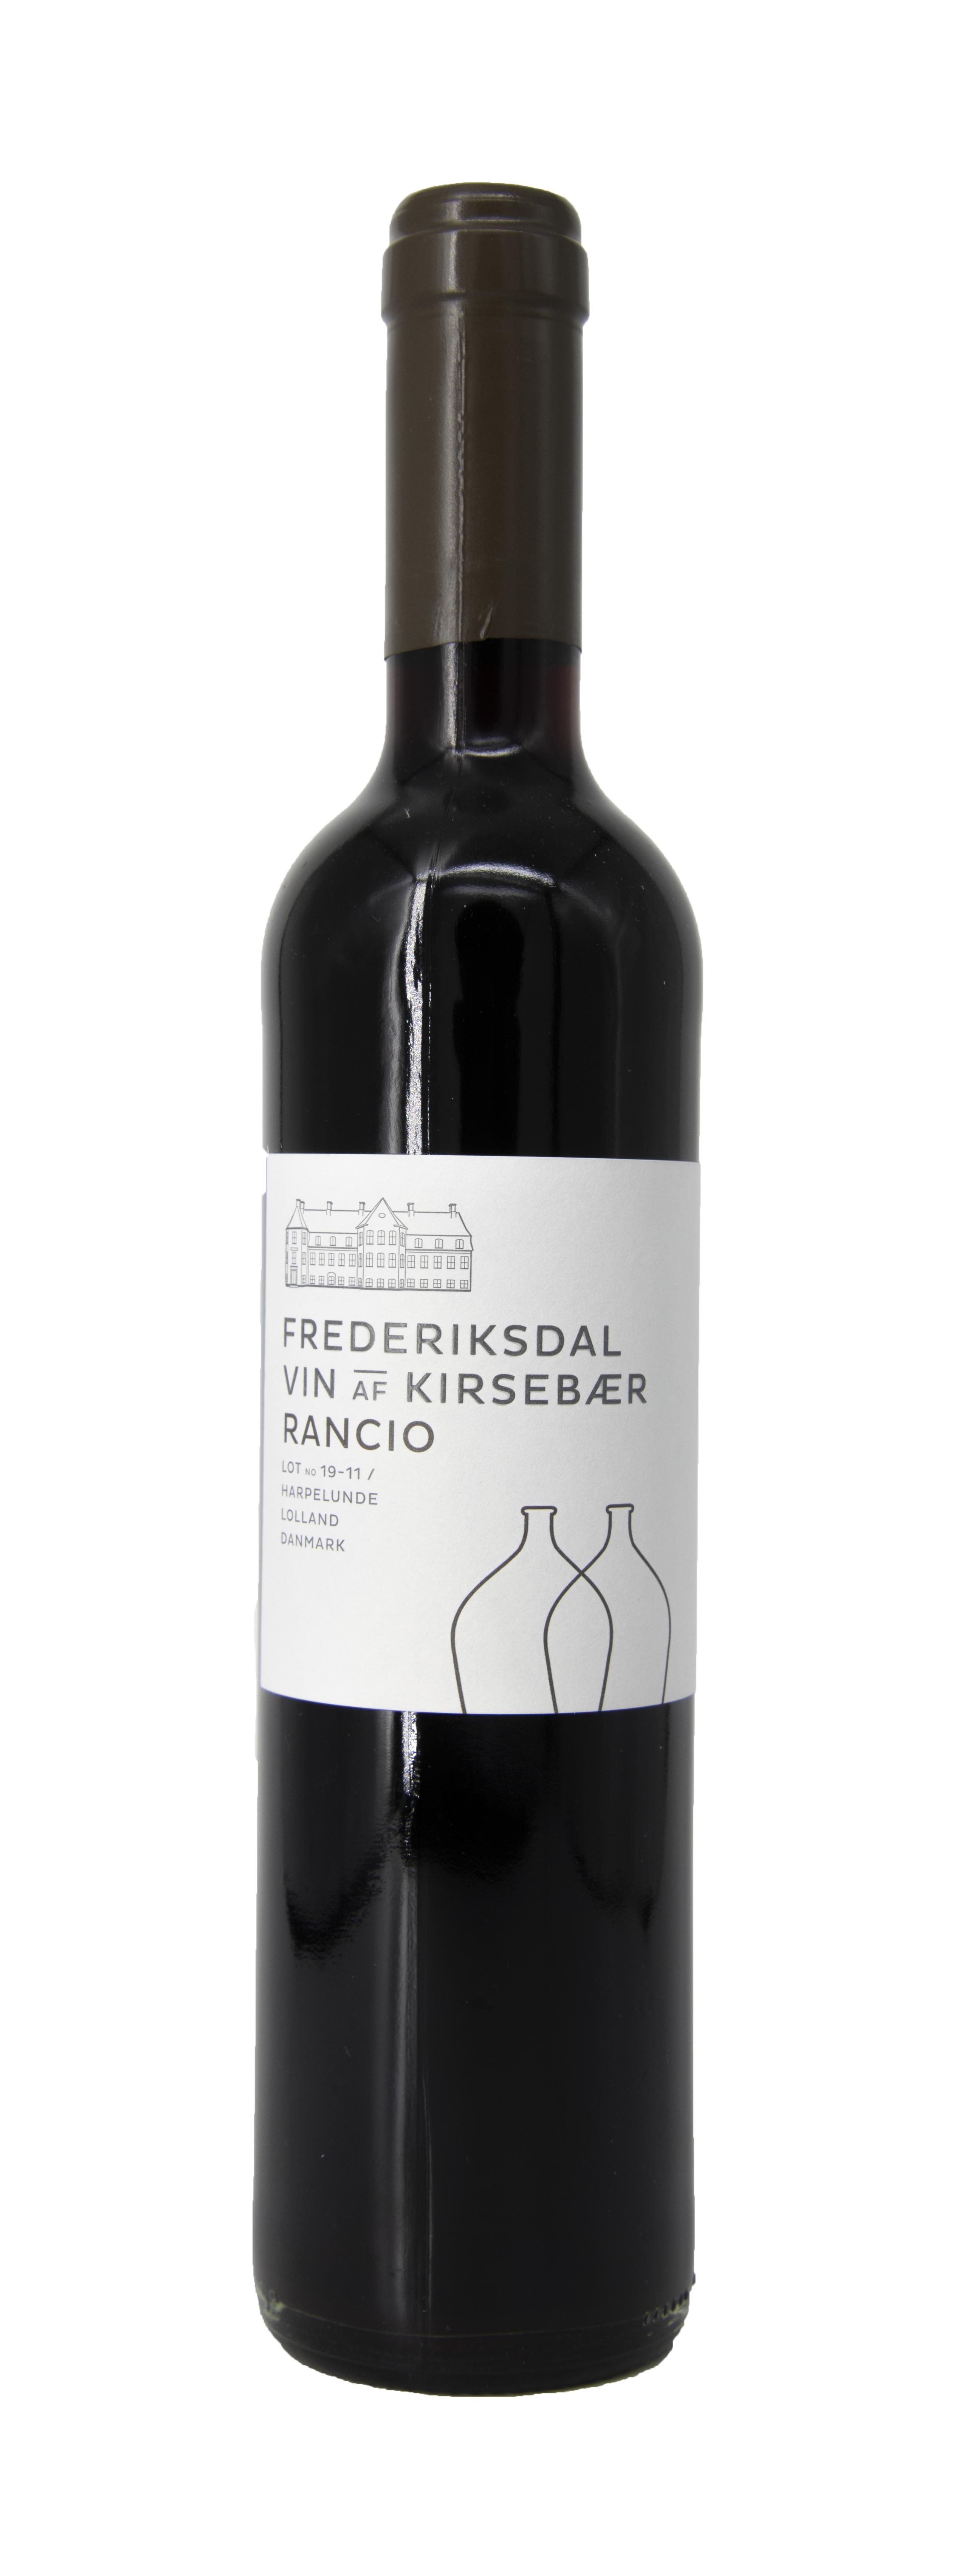 Frederiksdal Rancio